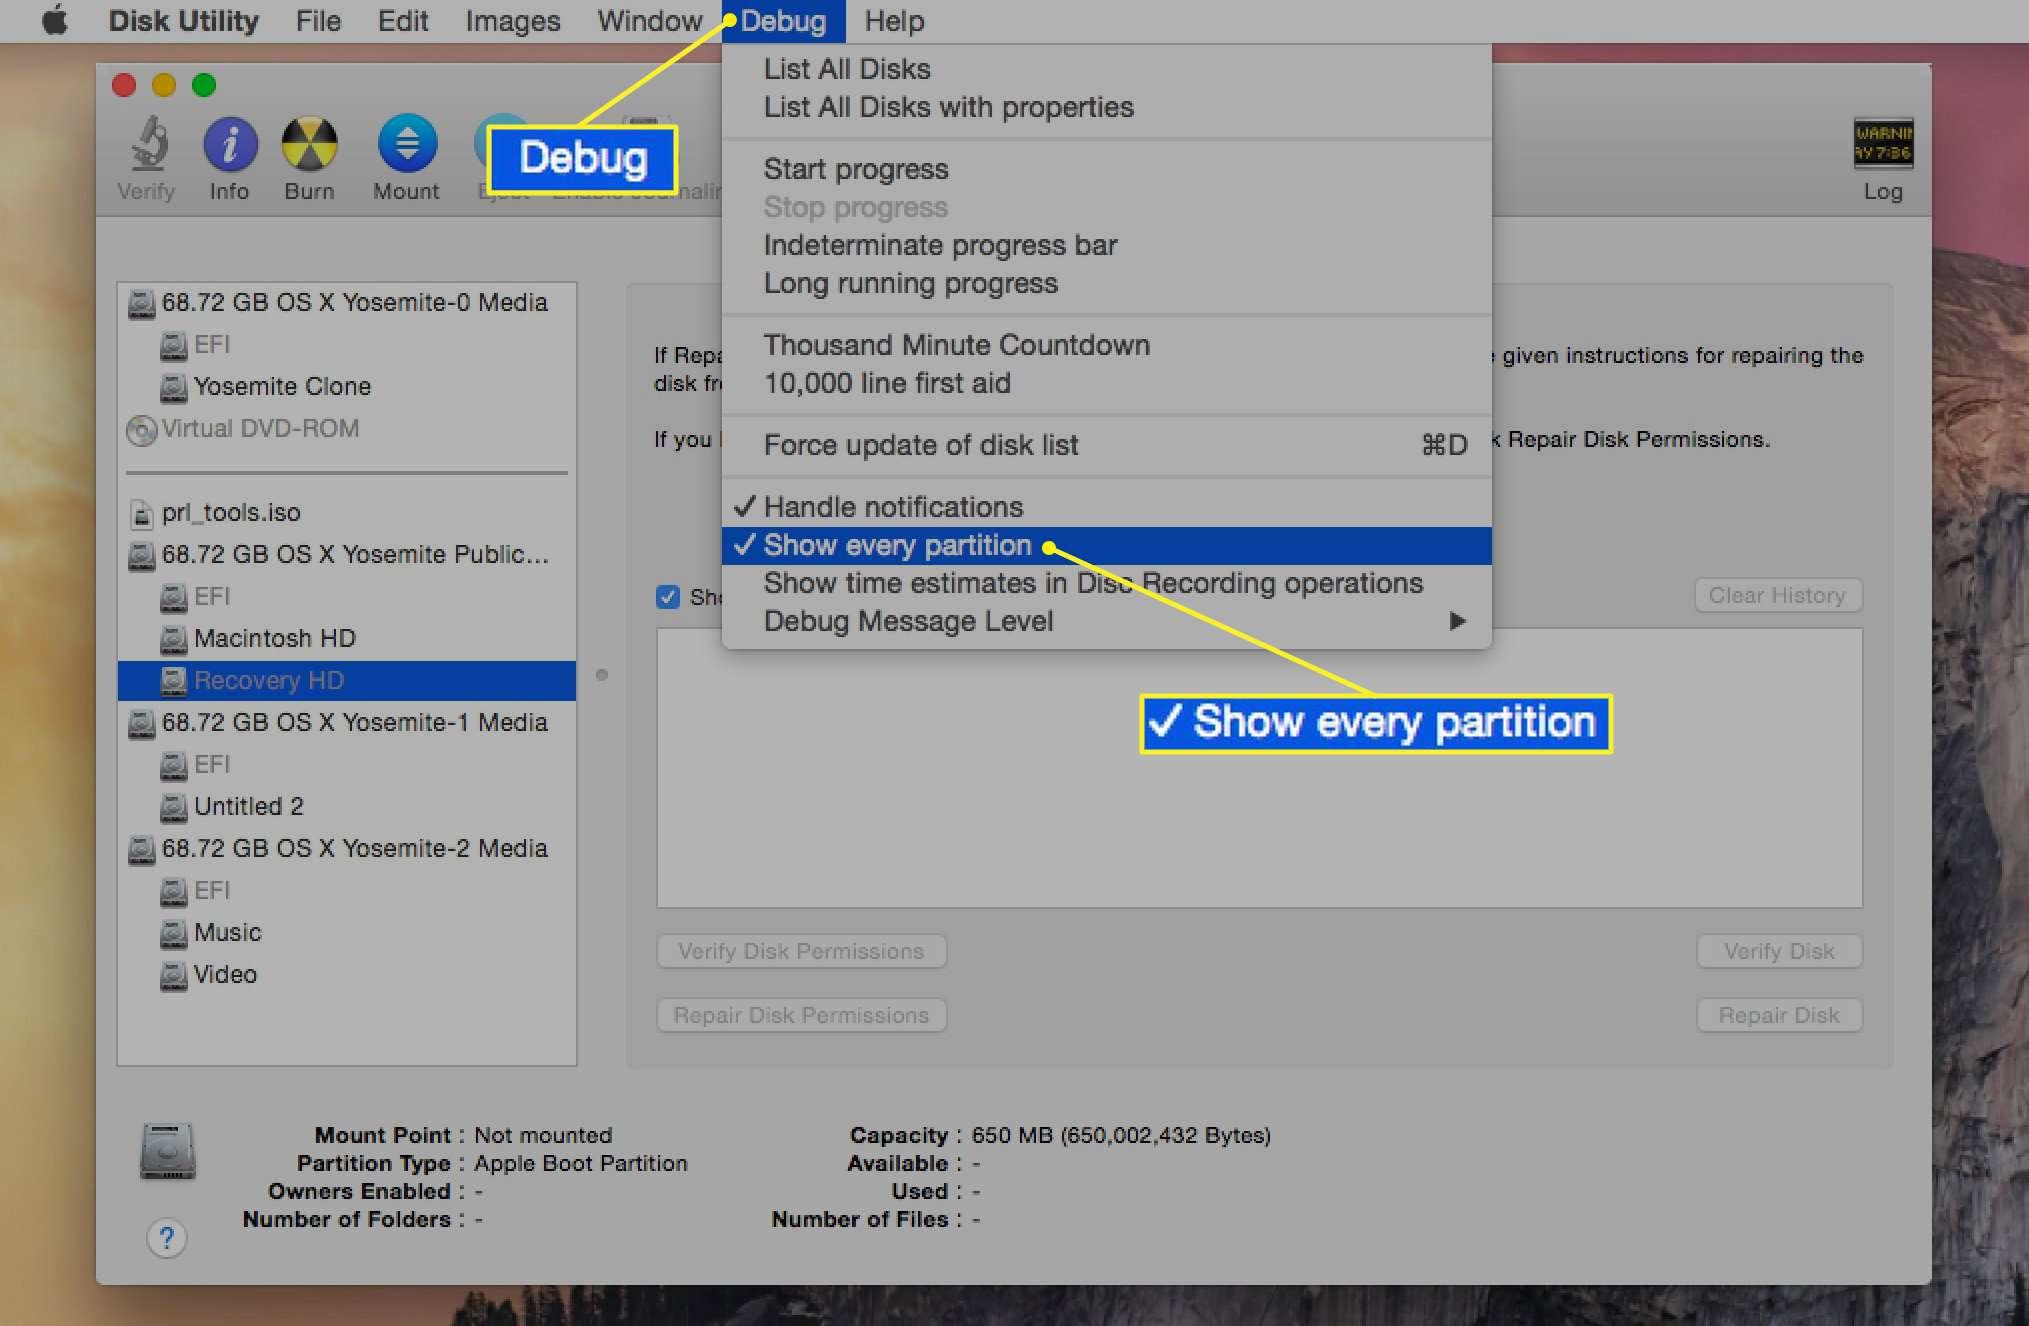 The hidden debug menu in Disk Utility